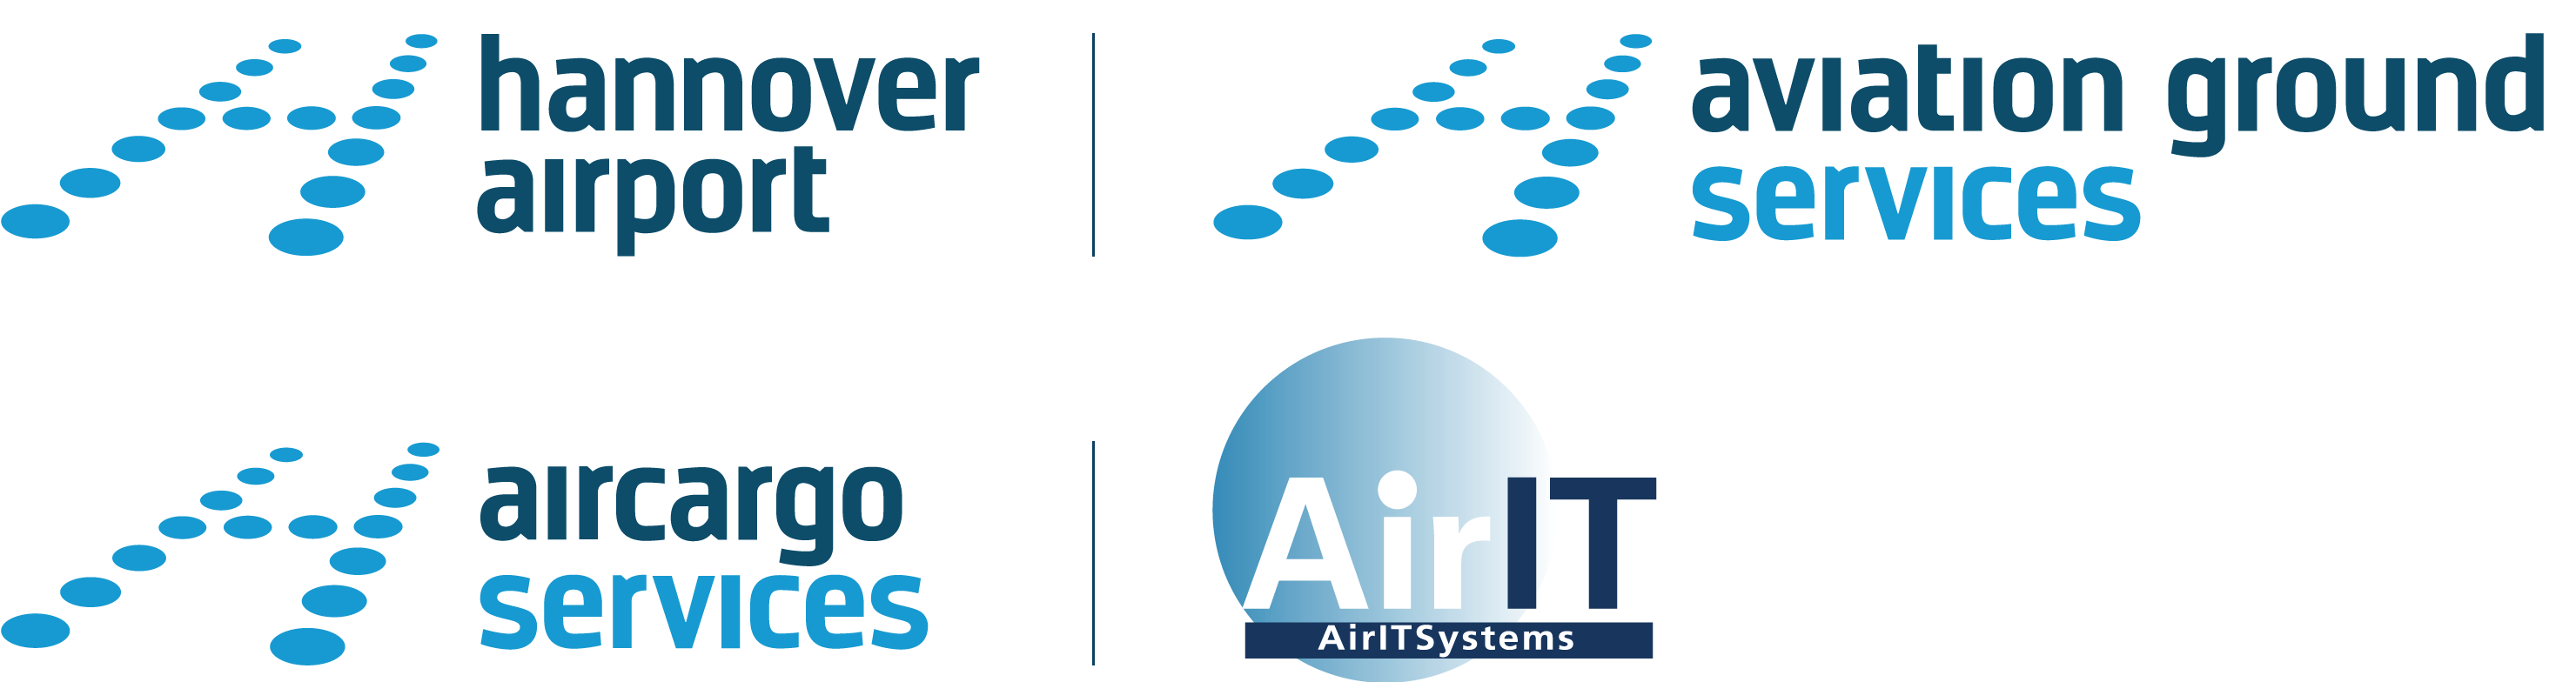 HAJ_all_logo